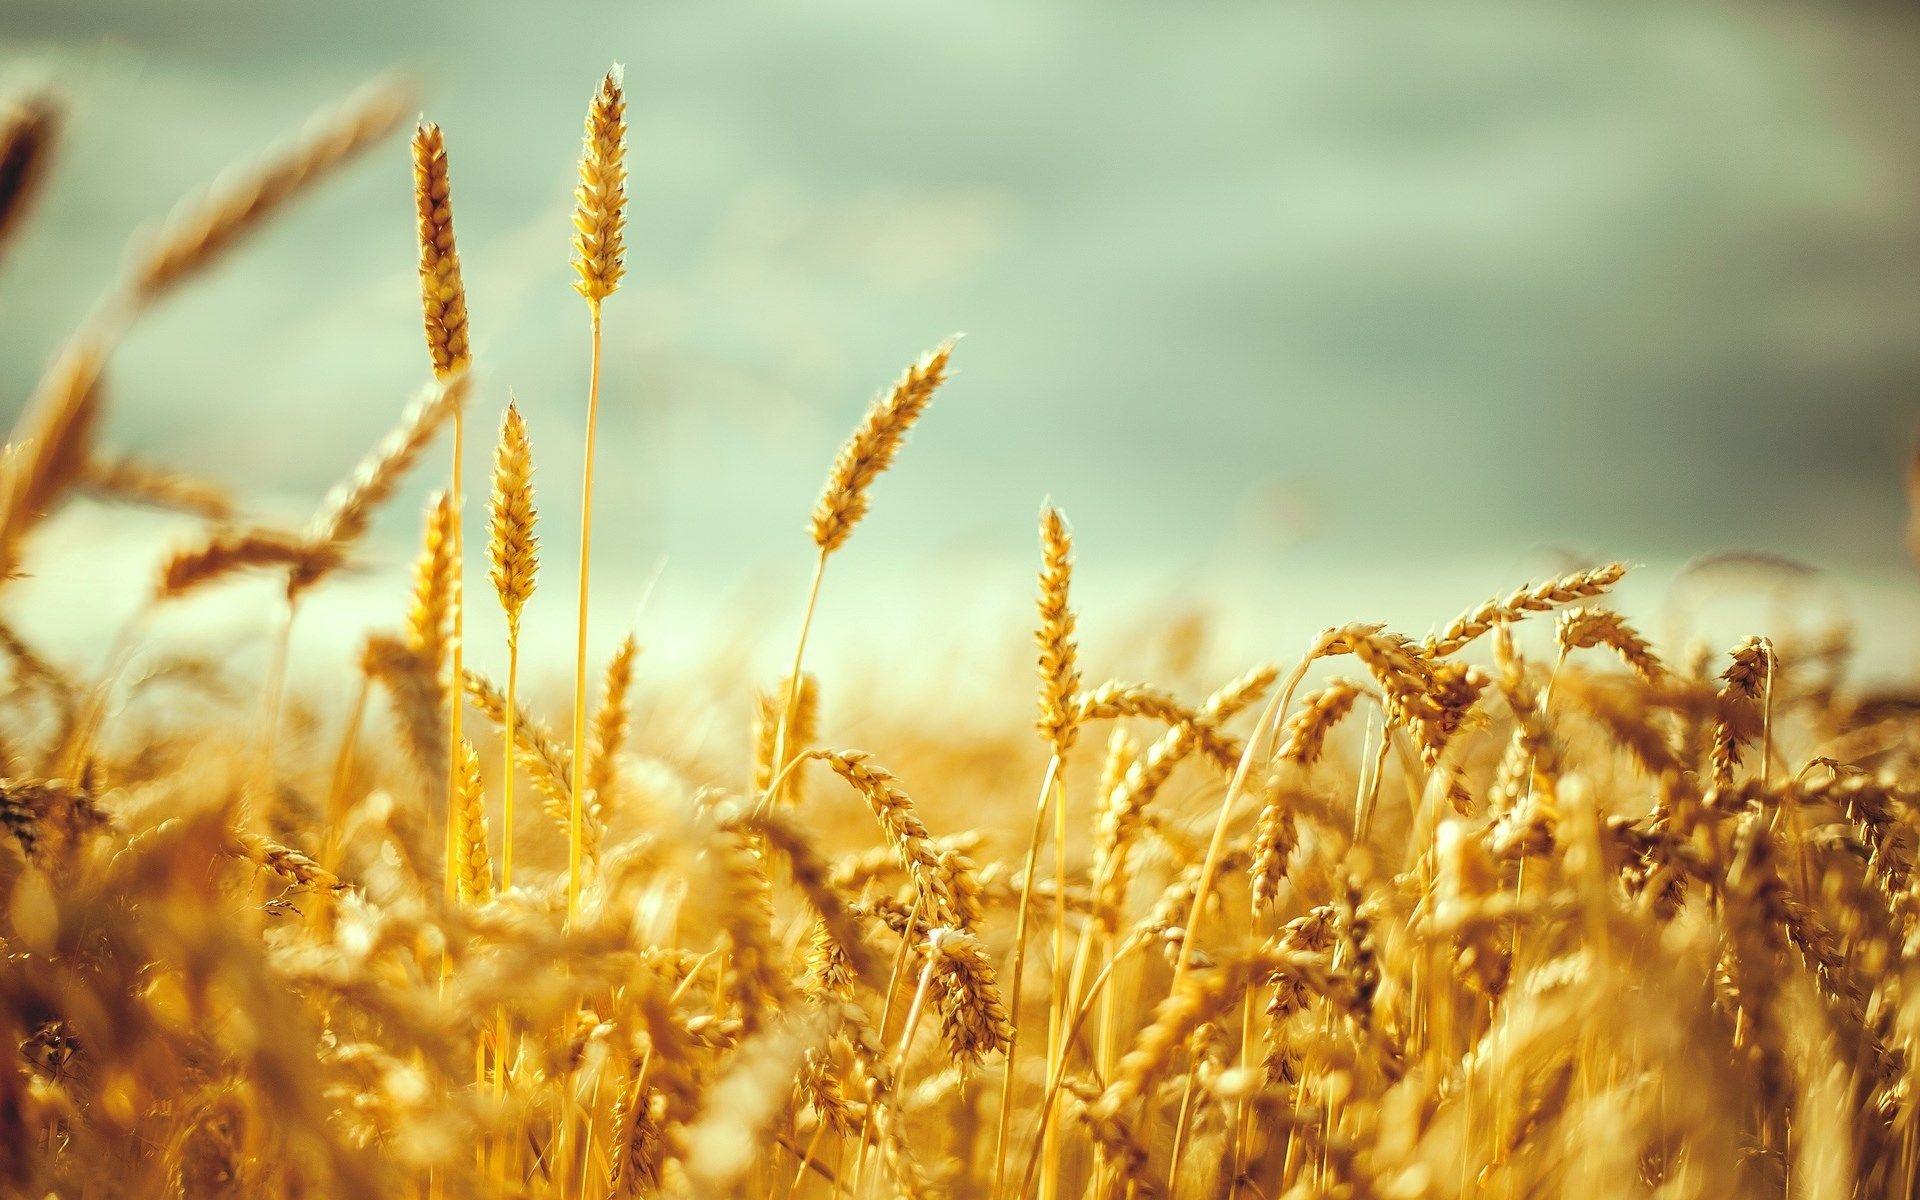 Wheat Wave Analysis – 25 February, 2020